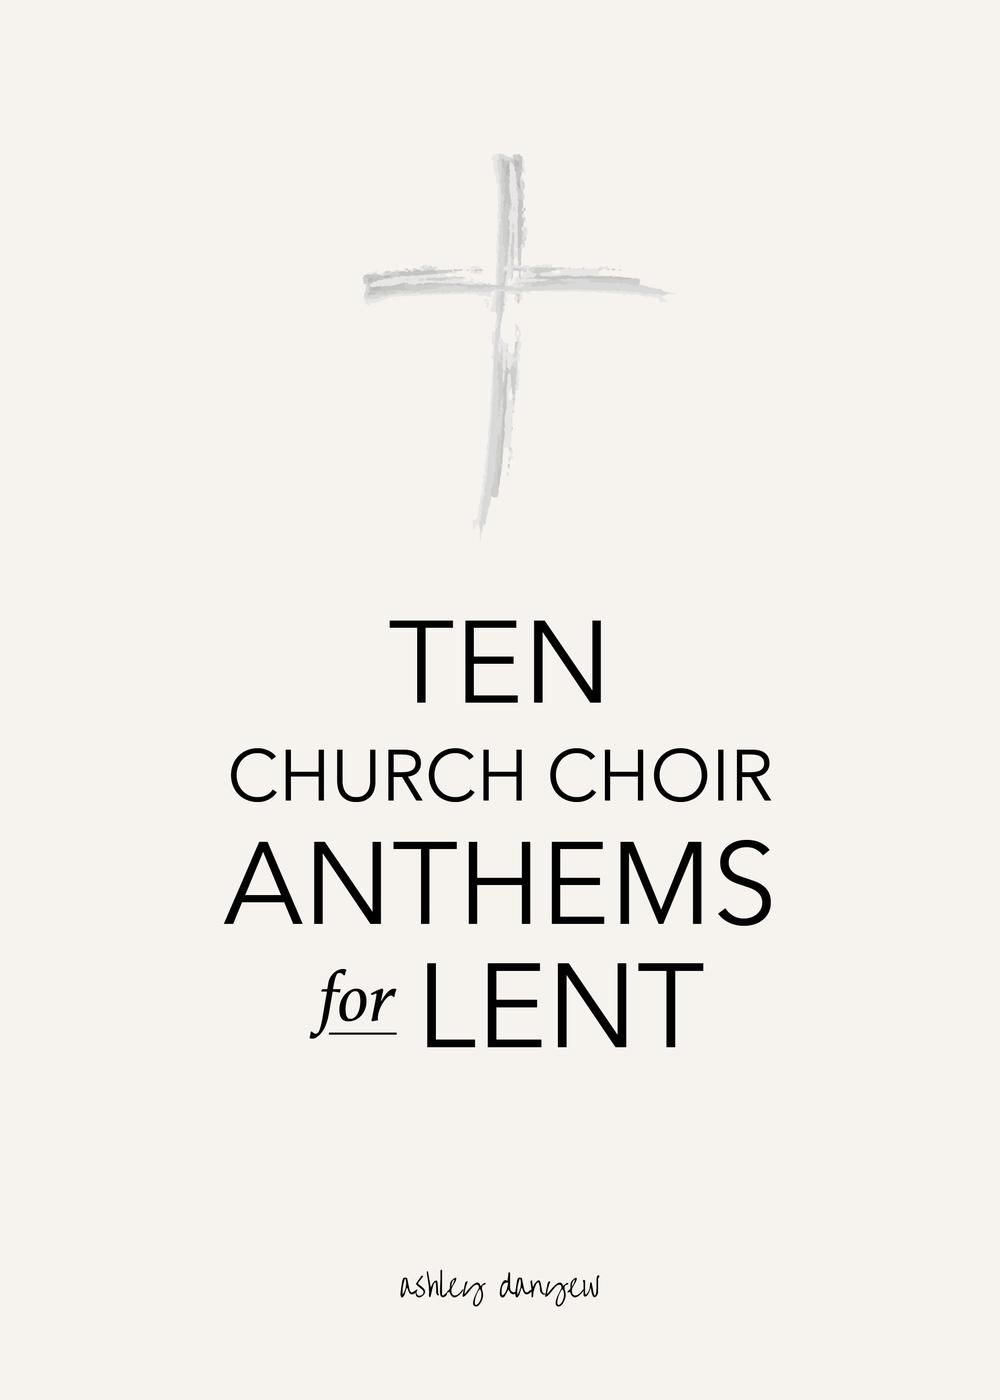 Copy of 10 Church Choir Anthems for Lent